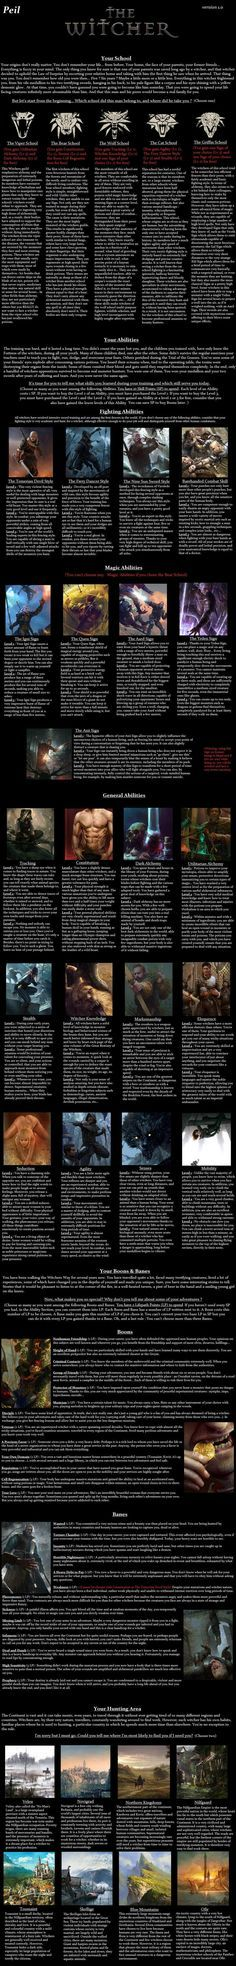 The Witcher CYOA - Album on Imgur